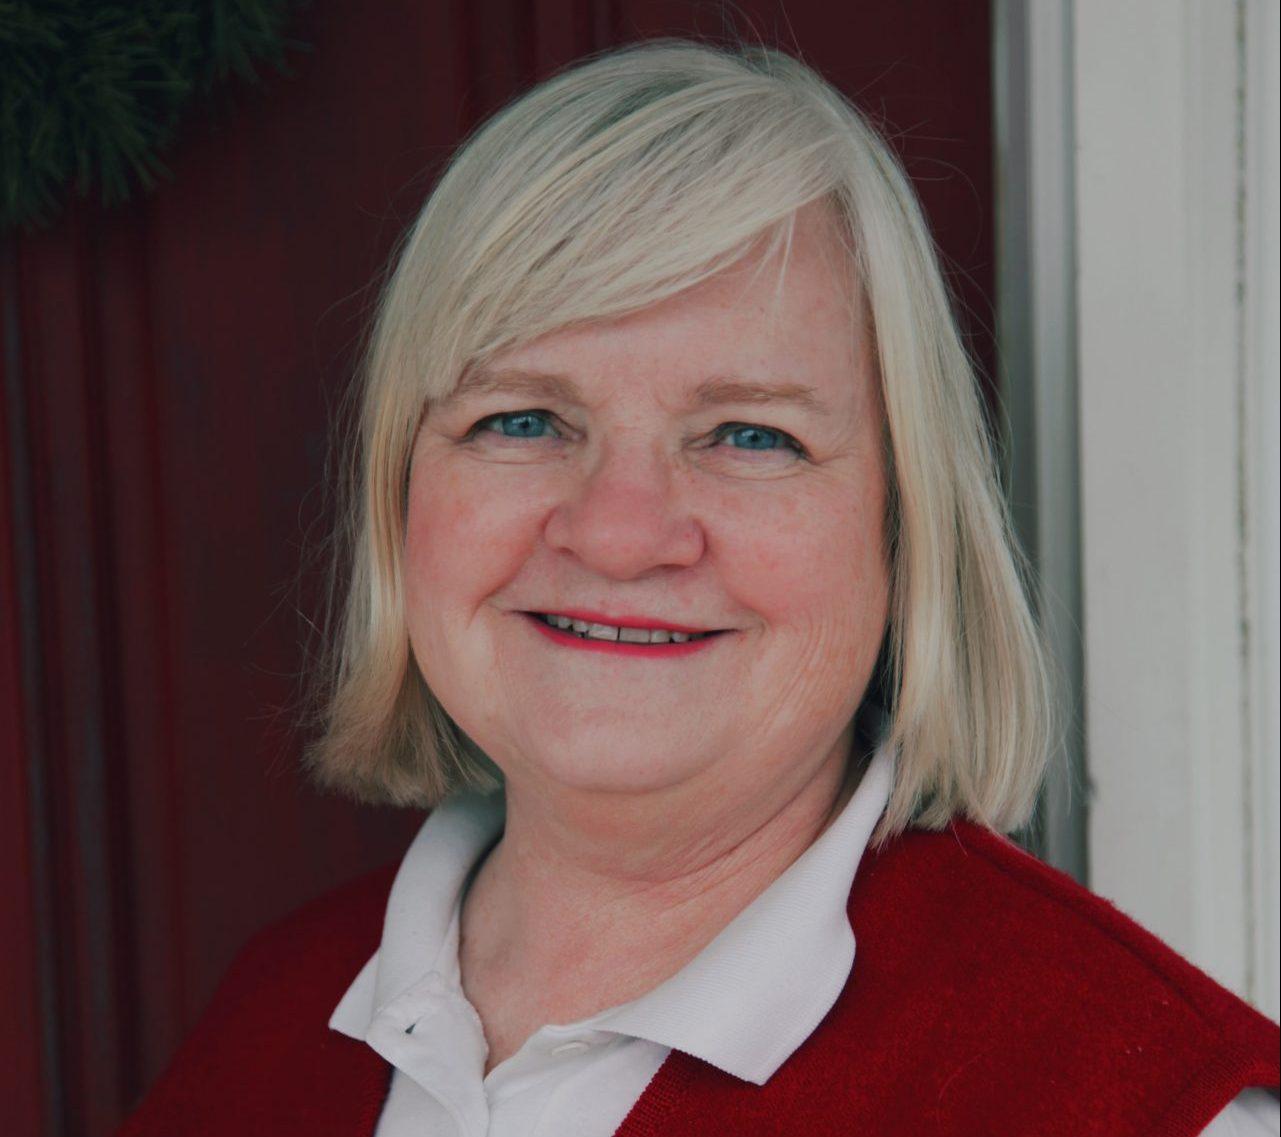 Janet Beavin